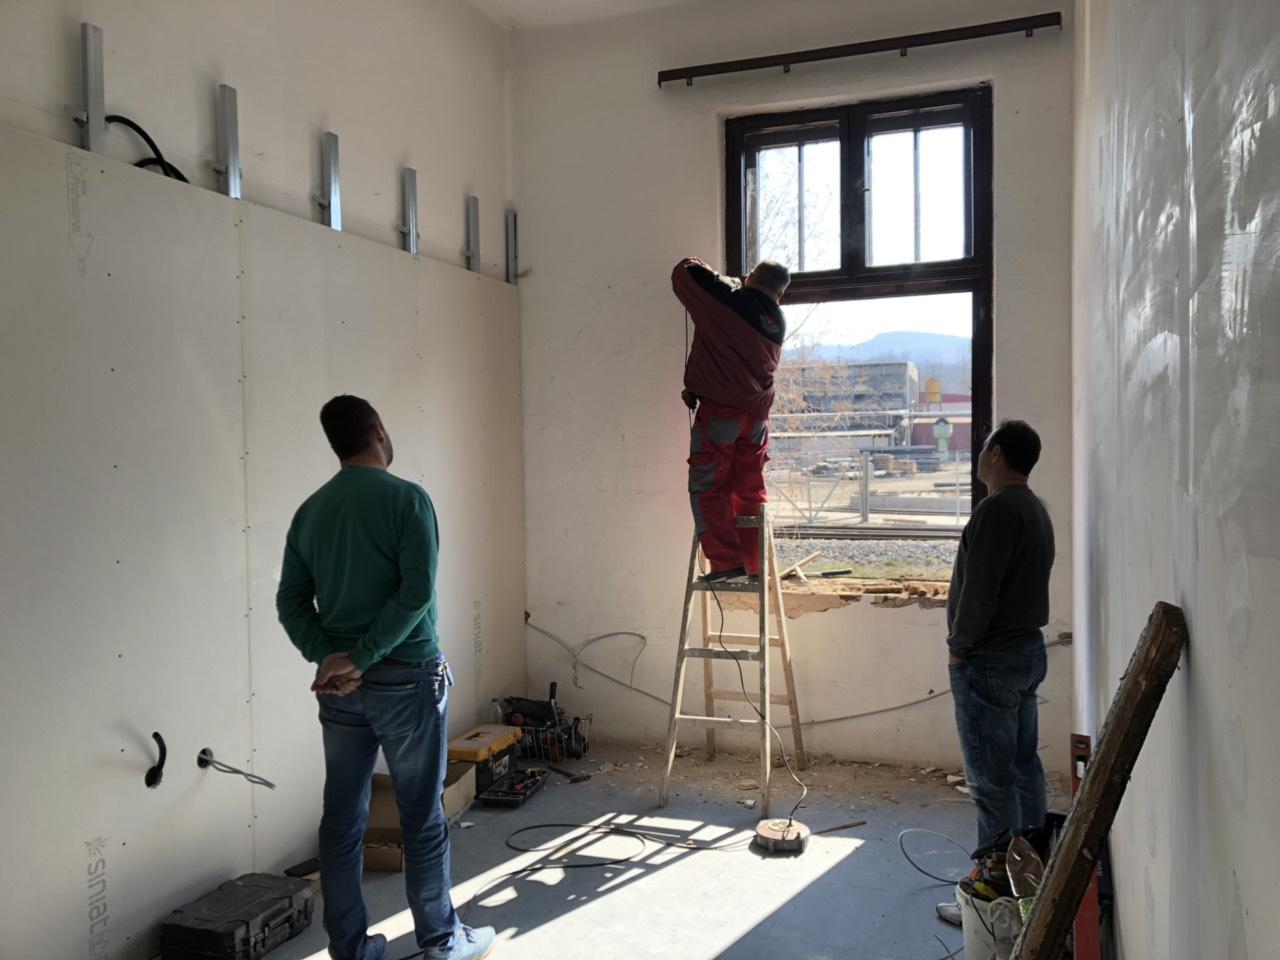 Rekonstrukcija učionice, foto: N.E.